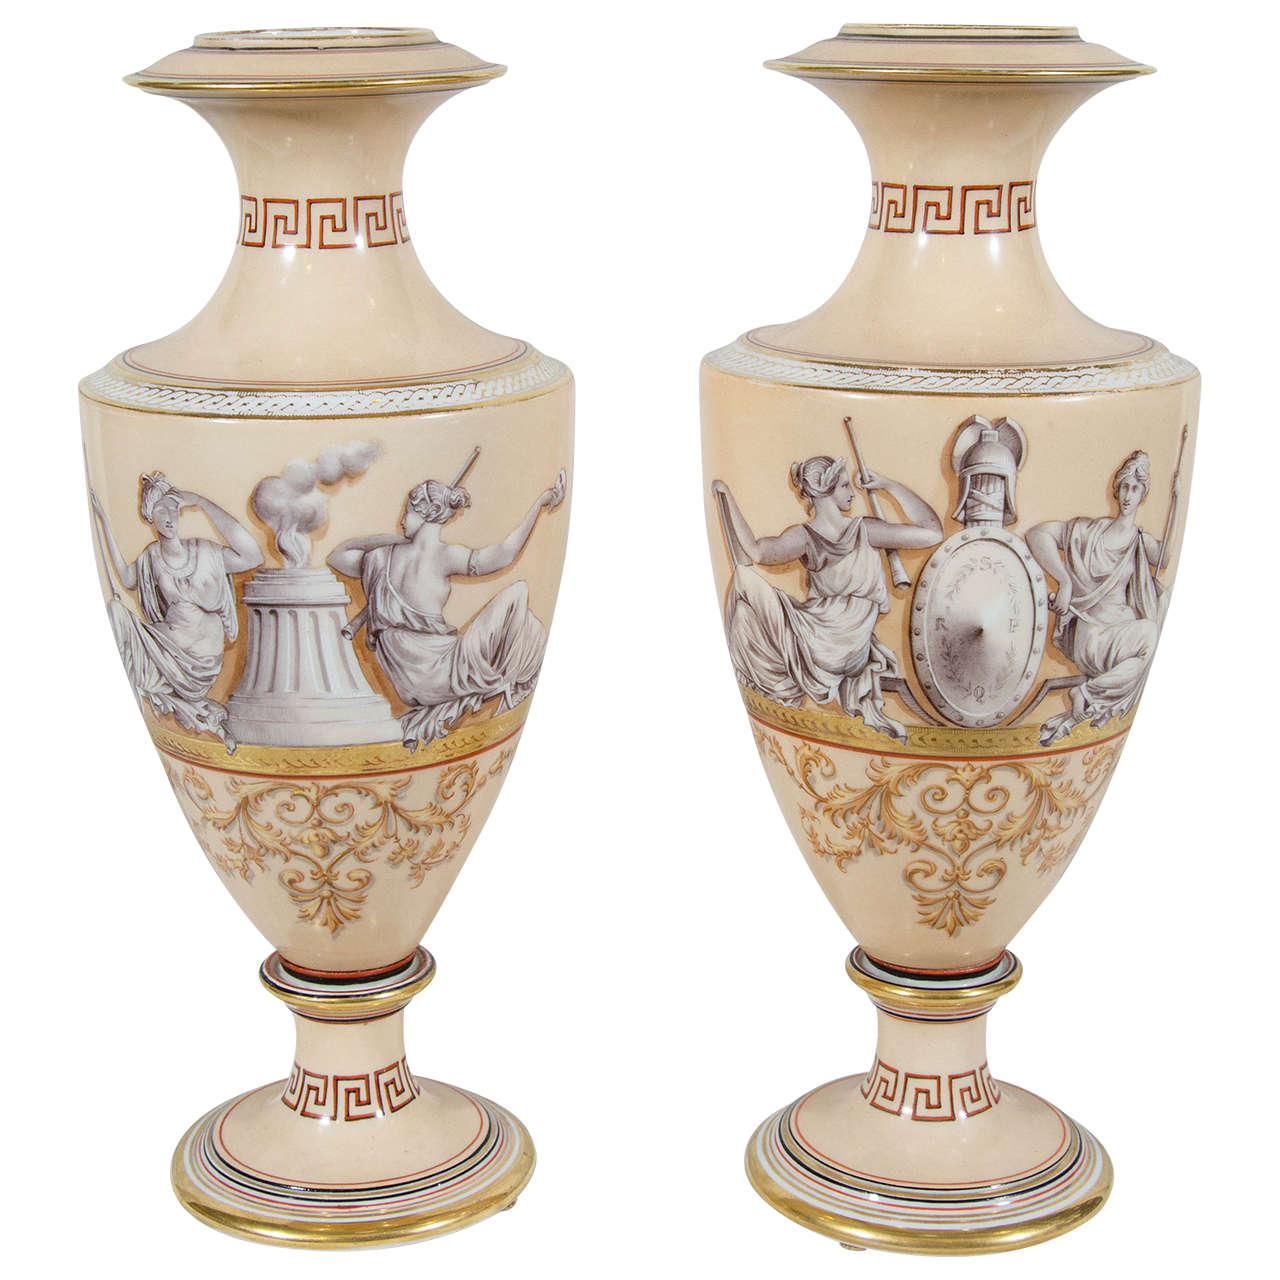 Pair of antique porcelain neoclassical vases with greek key detail pair of antique porcelain neoclassical vases with greek key detail for sale reviewsmspy